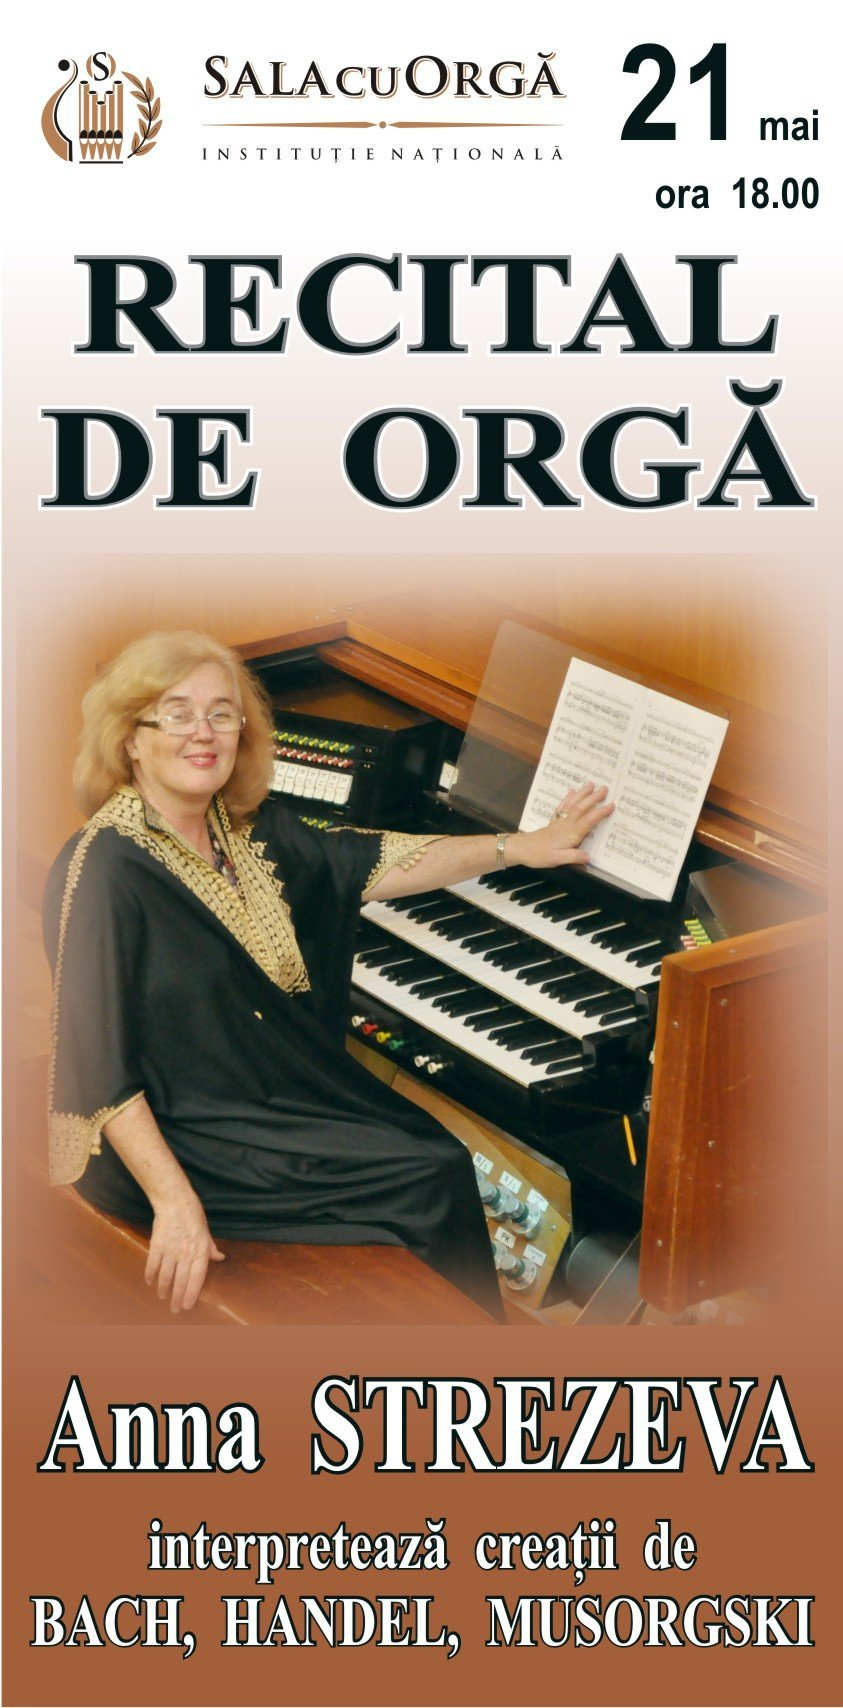 recital de orga cu anna strezeva